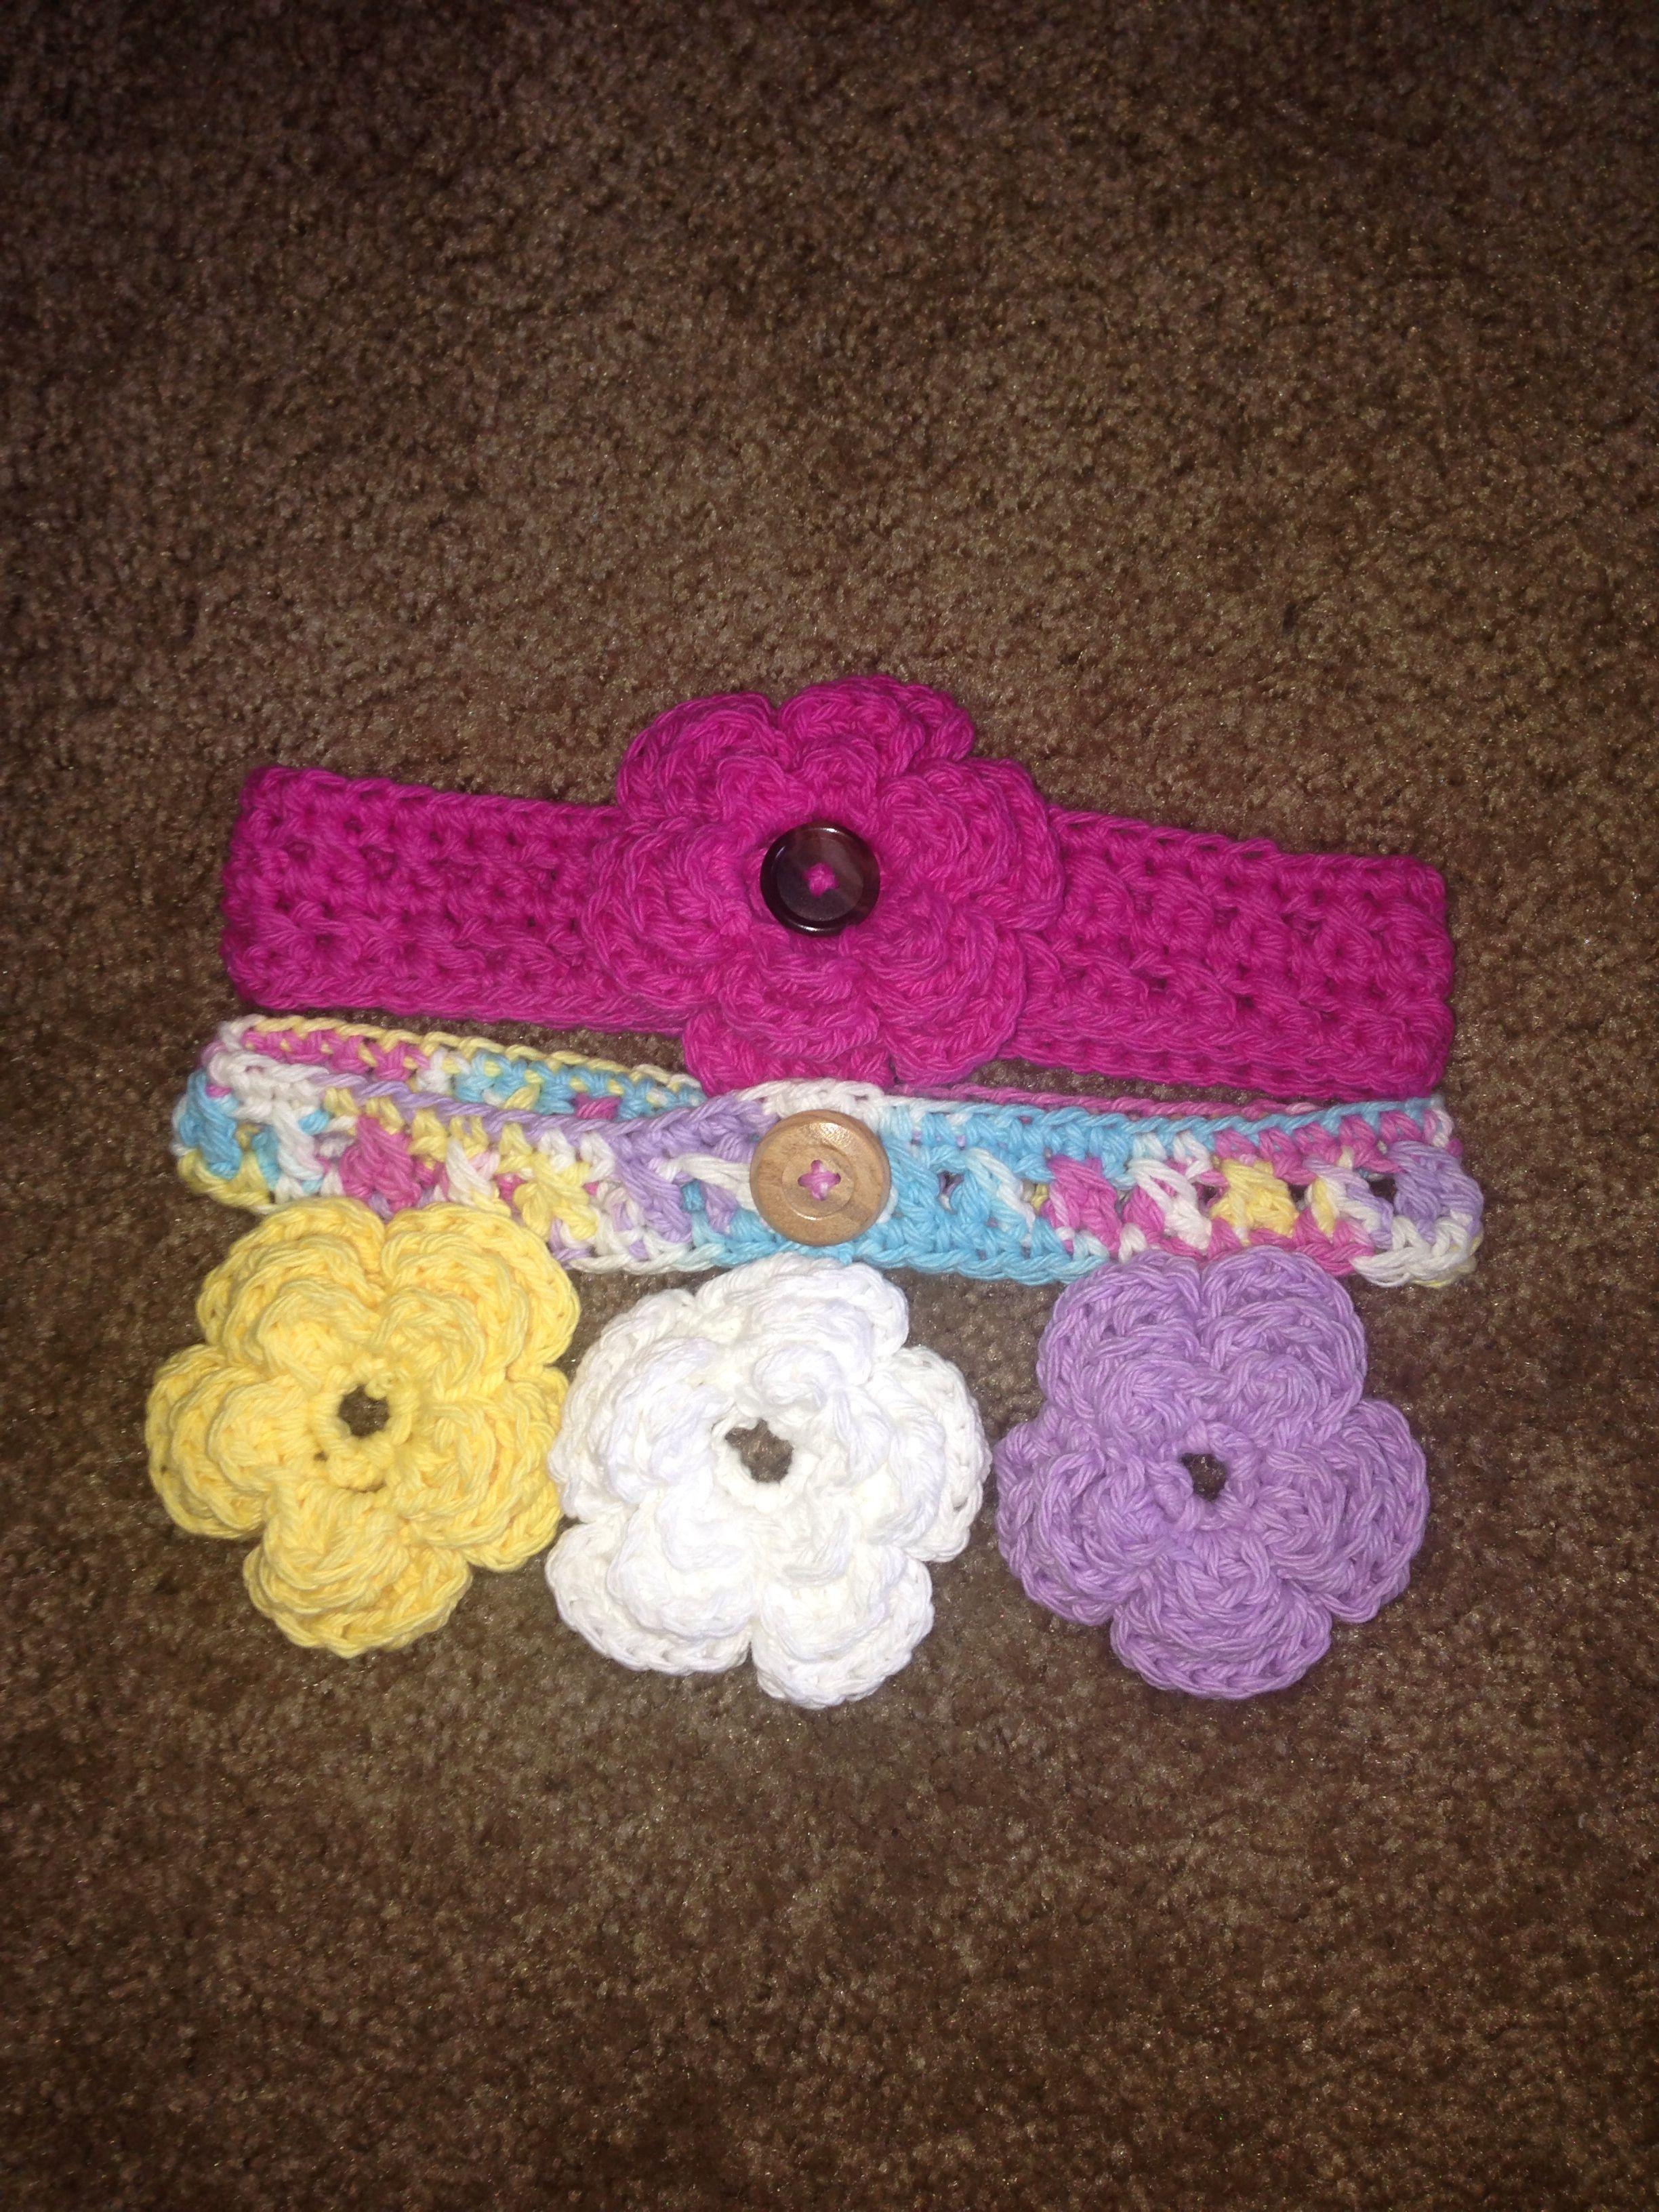 Baby crochet headband with detachable flowers